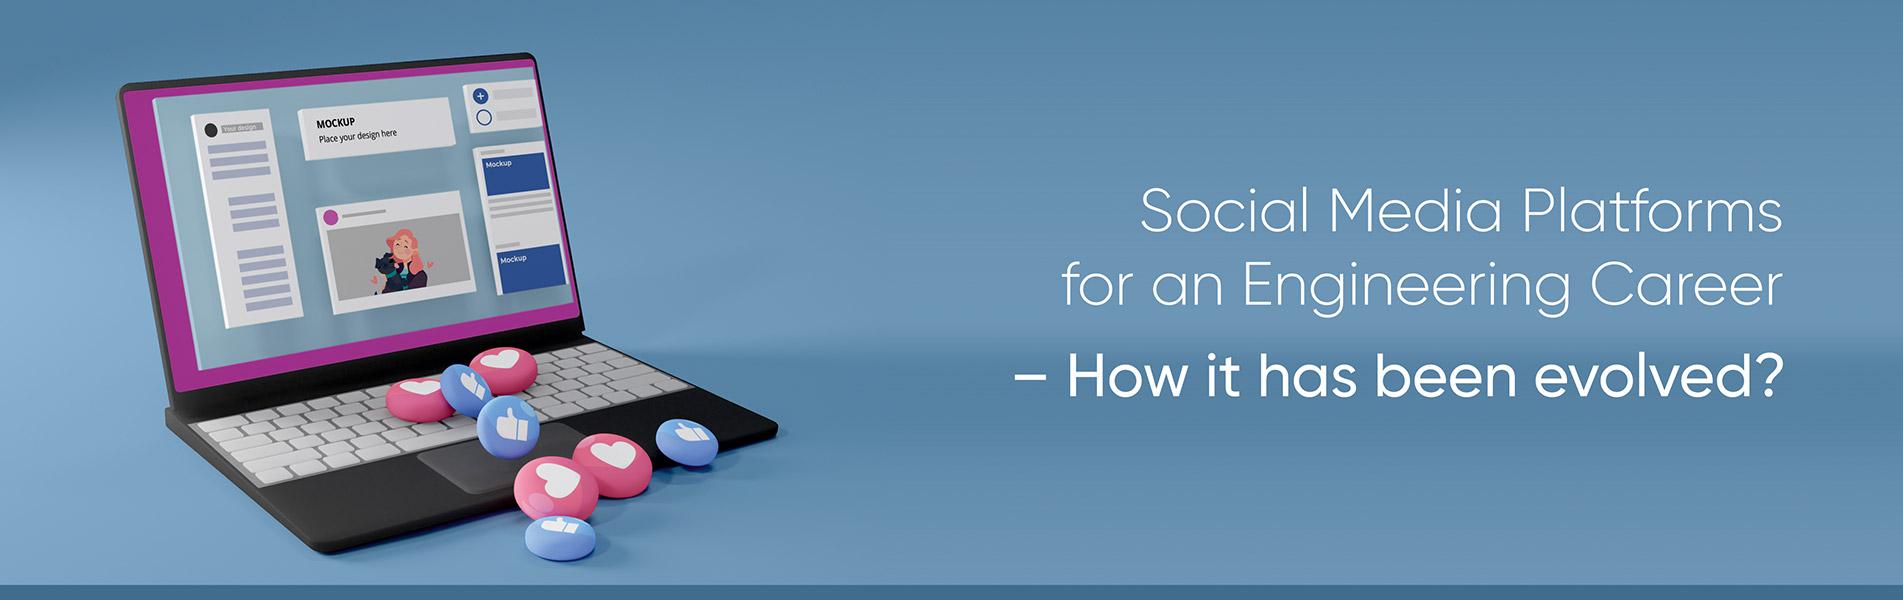 Social media platforms, engineering career